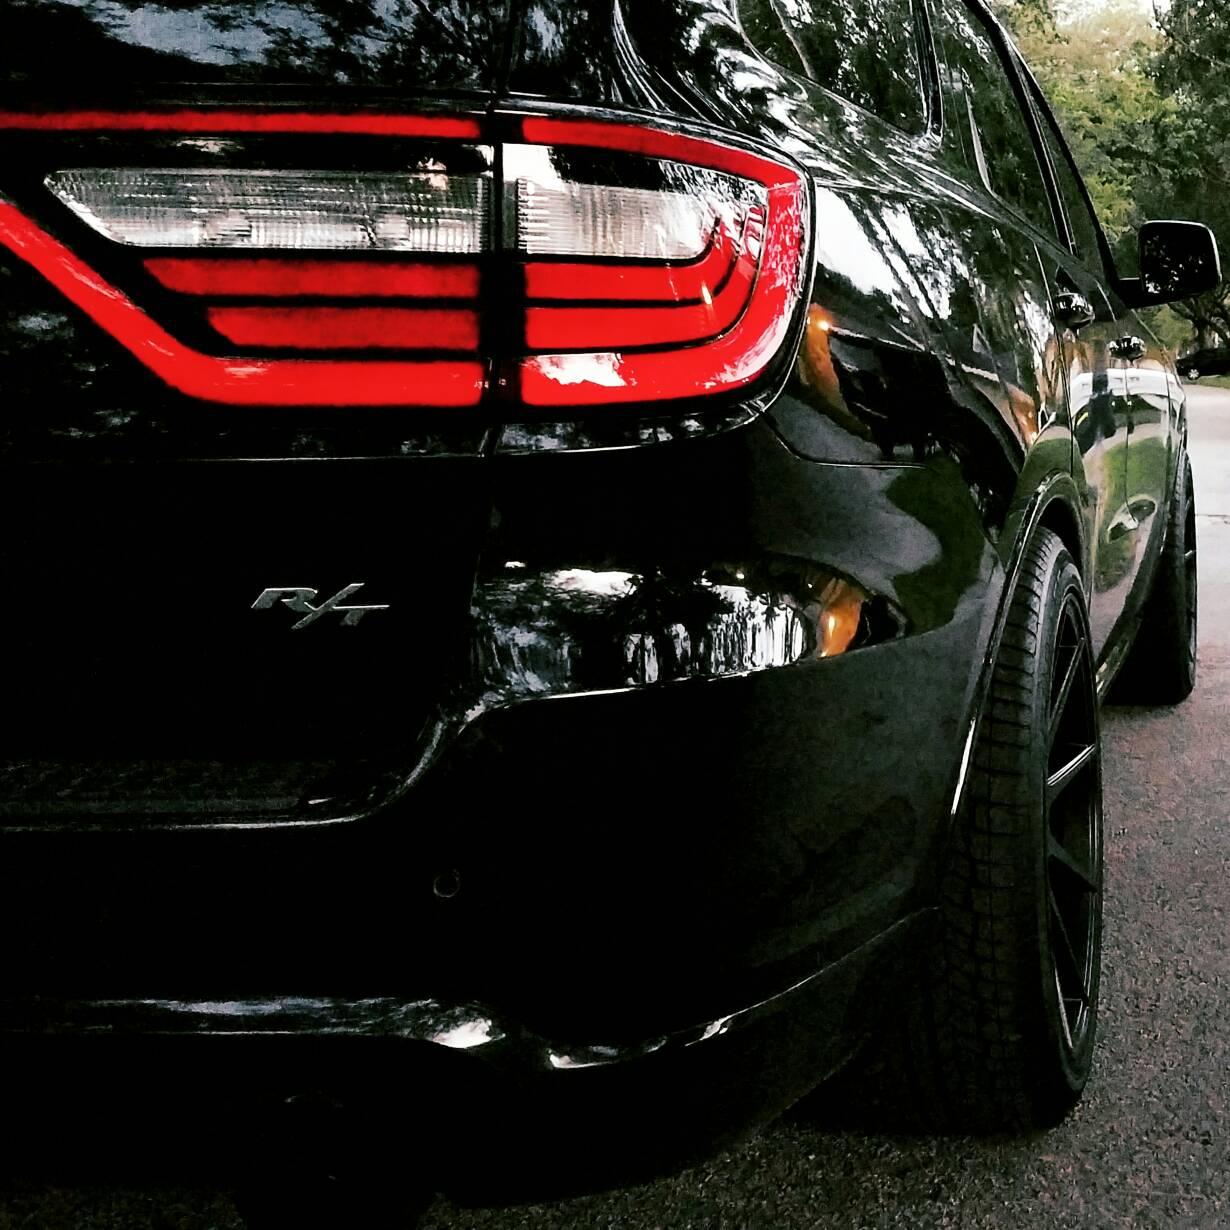 2016 Dodge Durango Suspension: Lowered 15' RT Feedback?